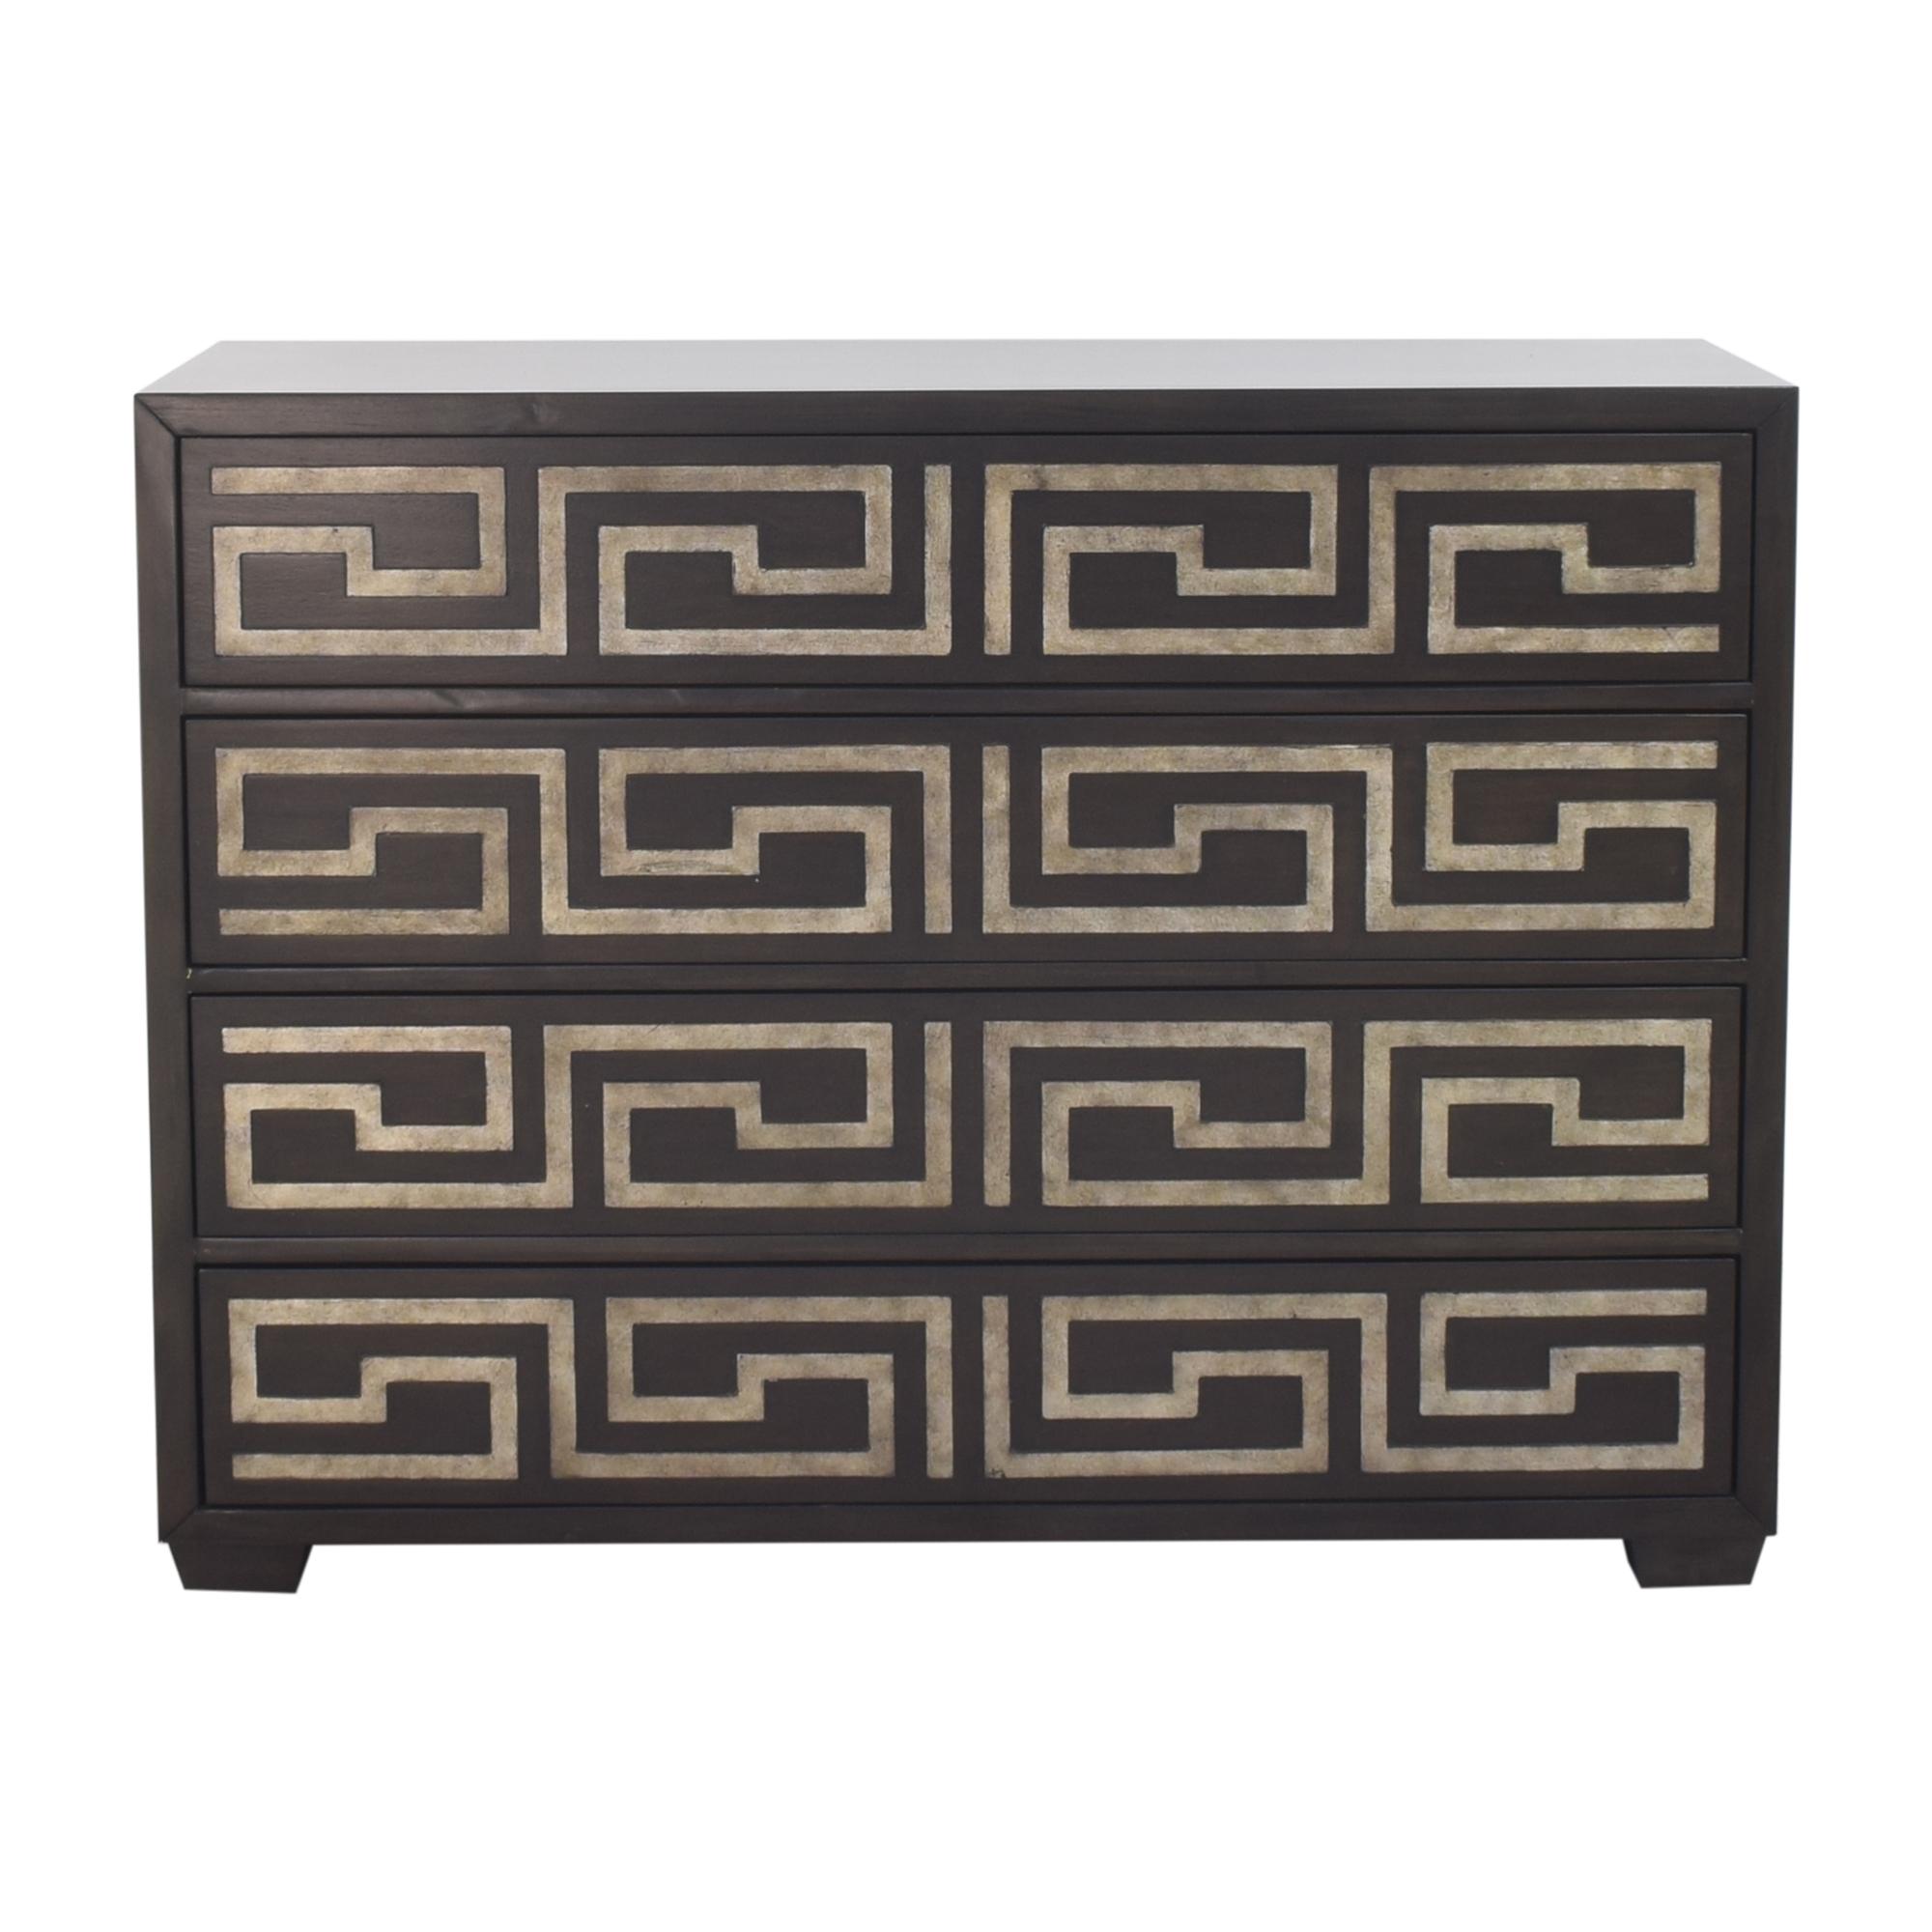 Hekman Furniture Hekman Furniture Meander Pattern Chest nj